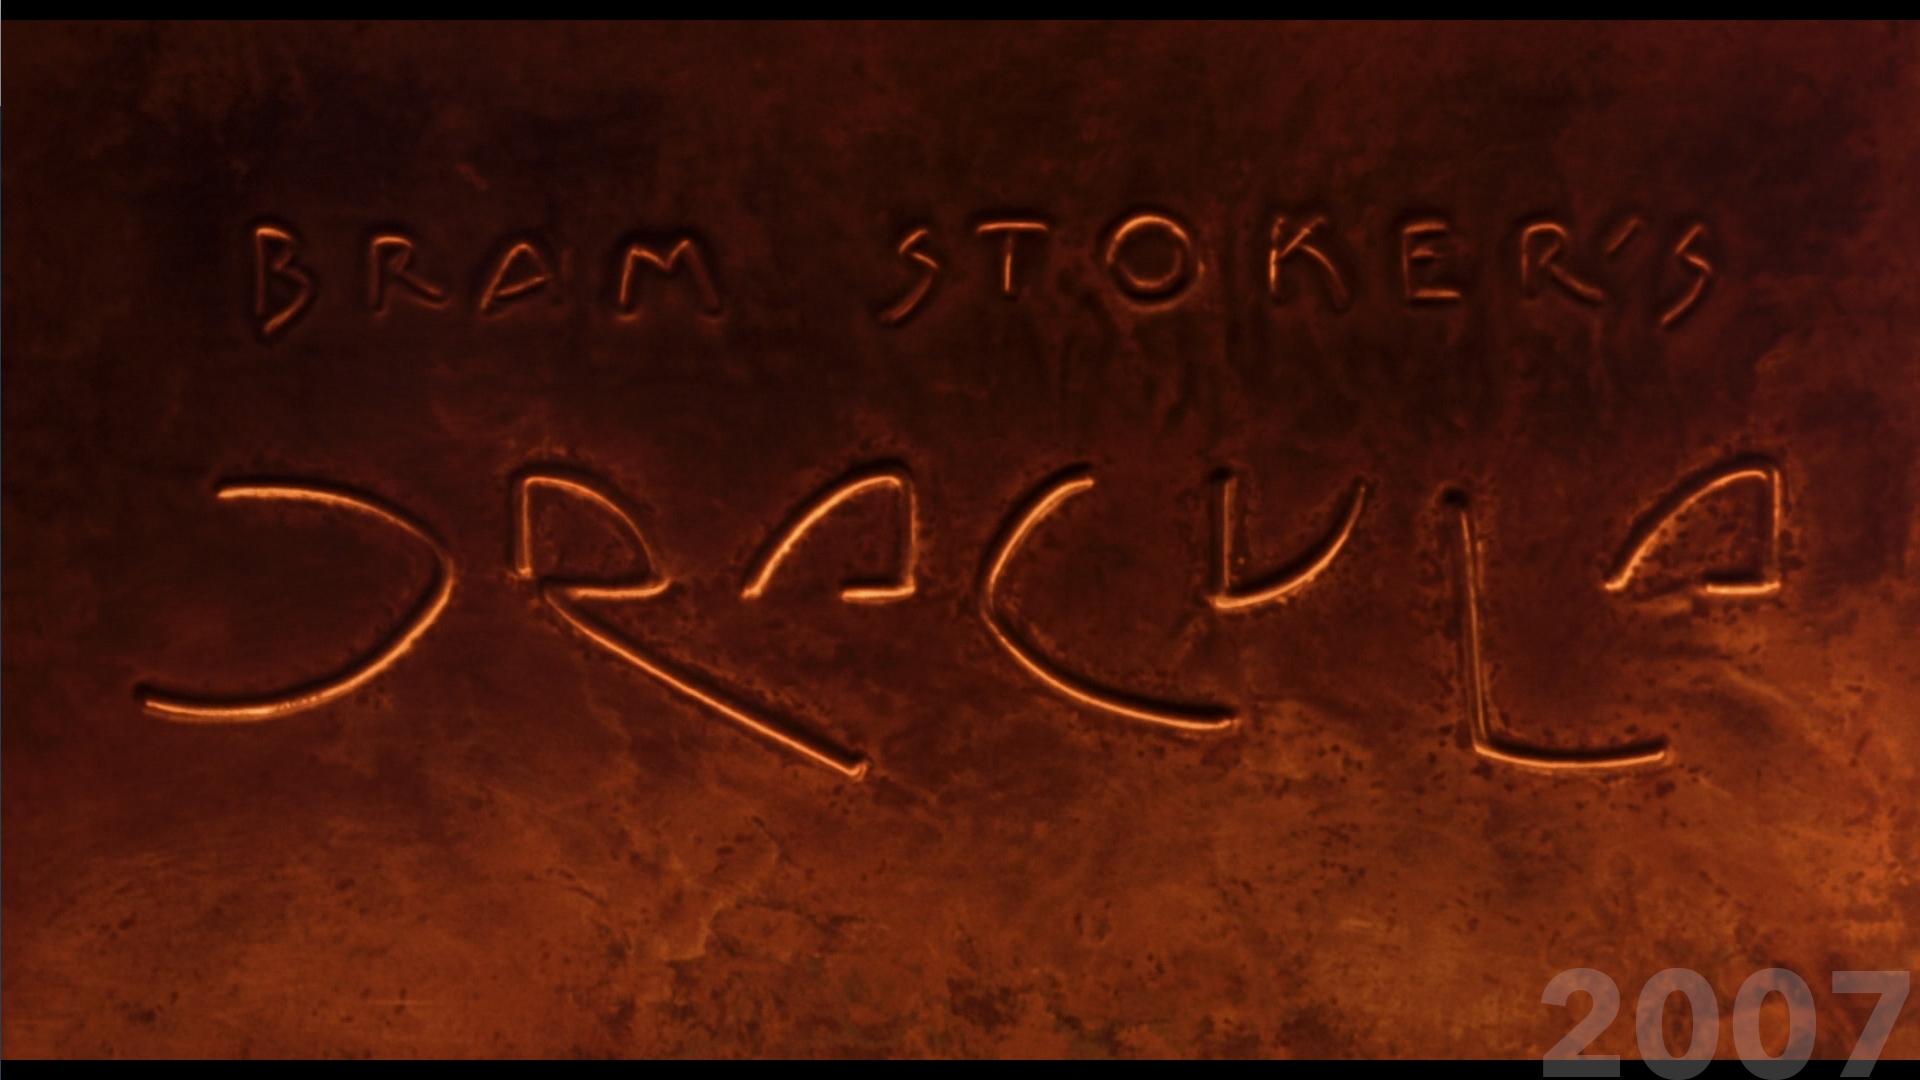 Bram Stoker's Dracula movie title 2007